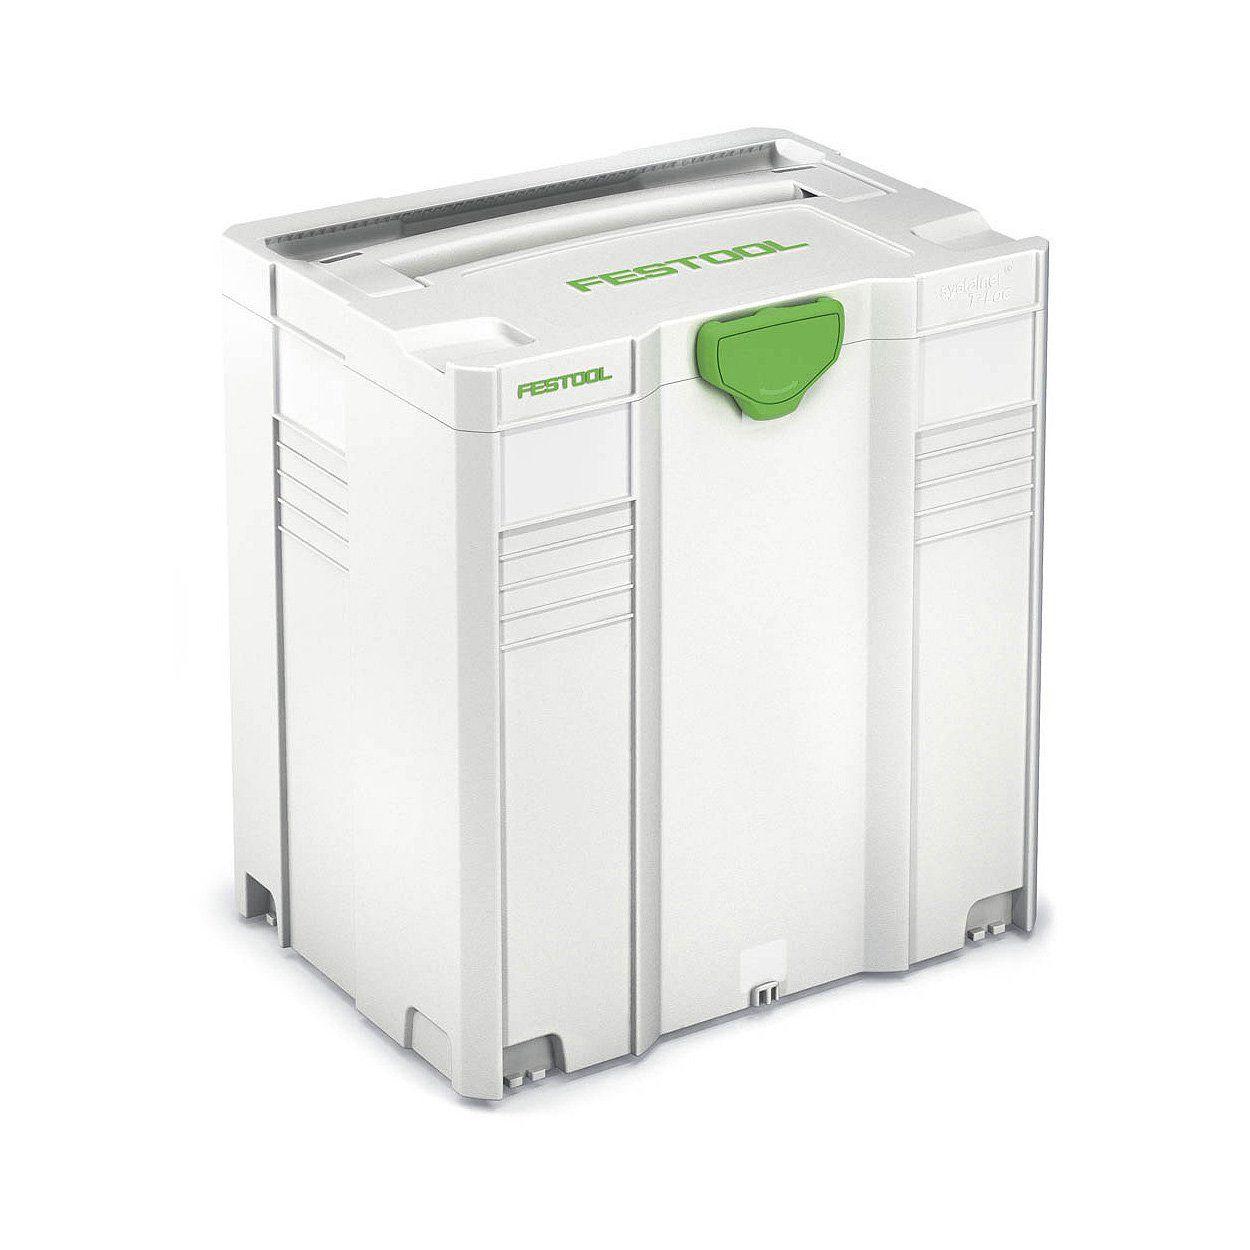 Festool systainer loc storage box sys 5 tl garden tool